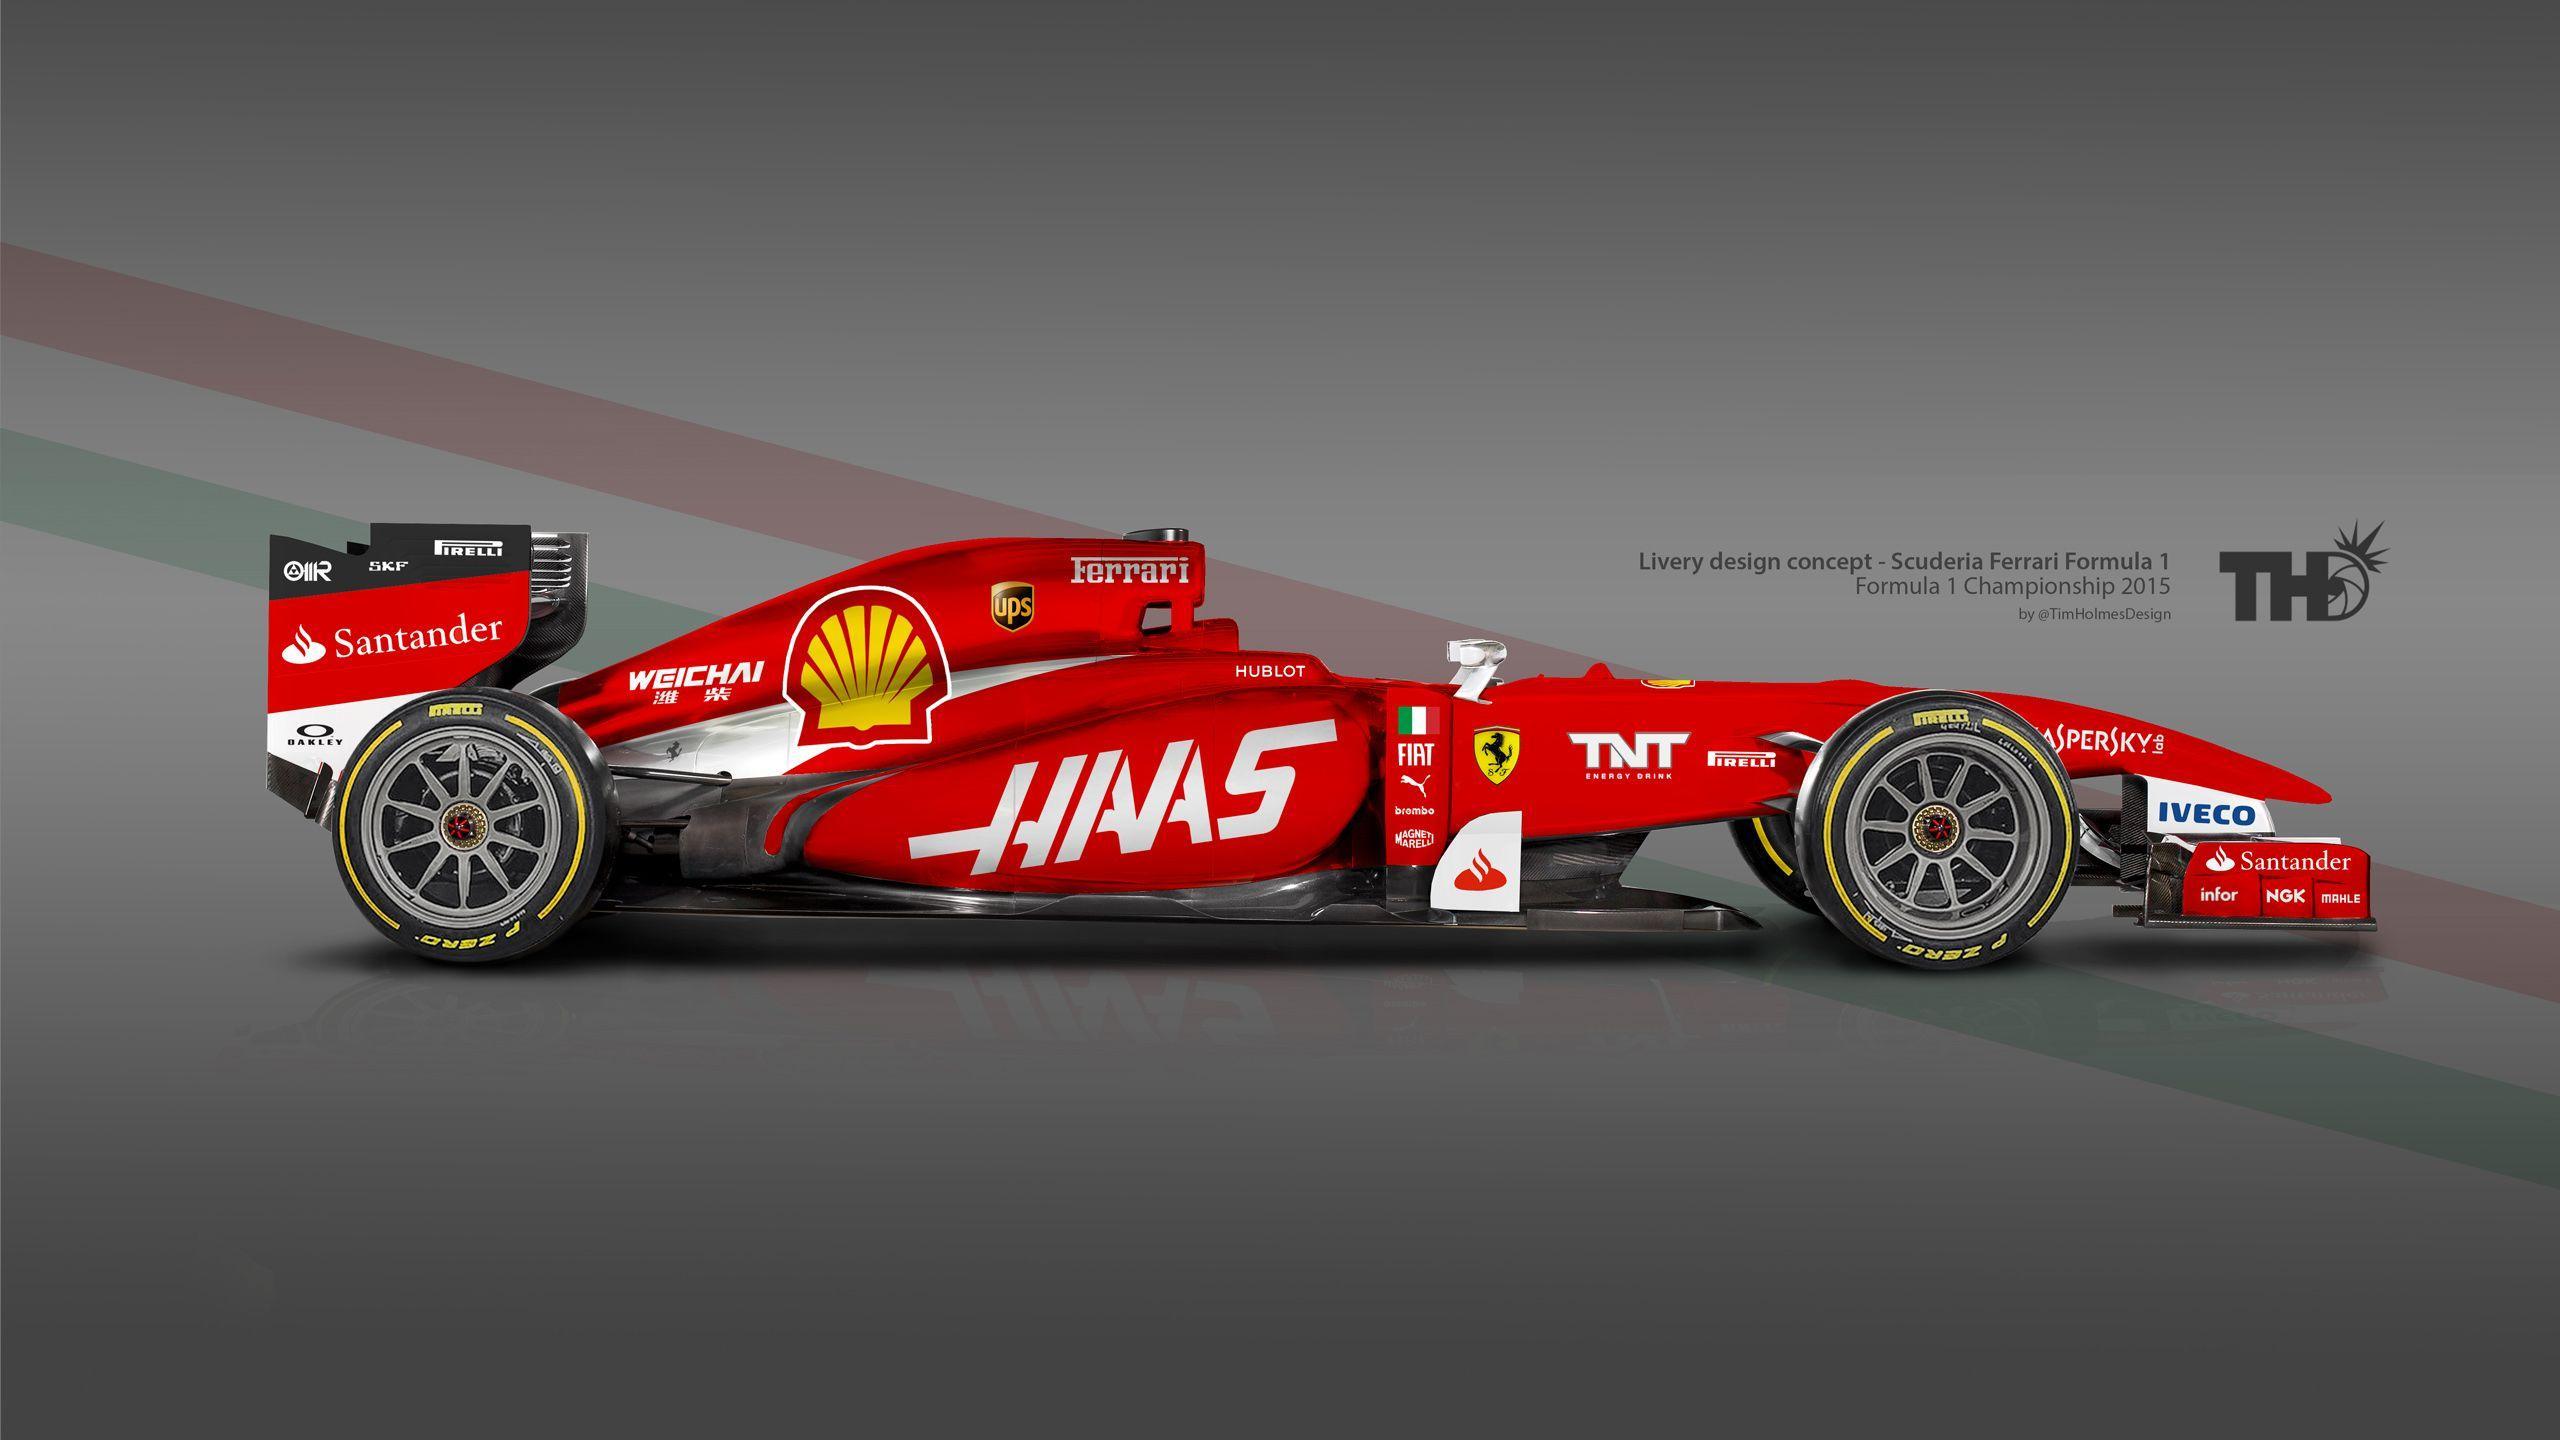 Ferrari F1 Wallpapers Top Free Ferrari F1 Backgrounds